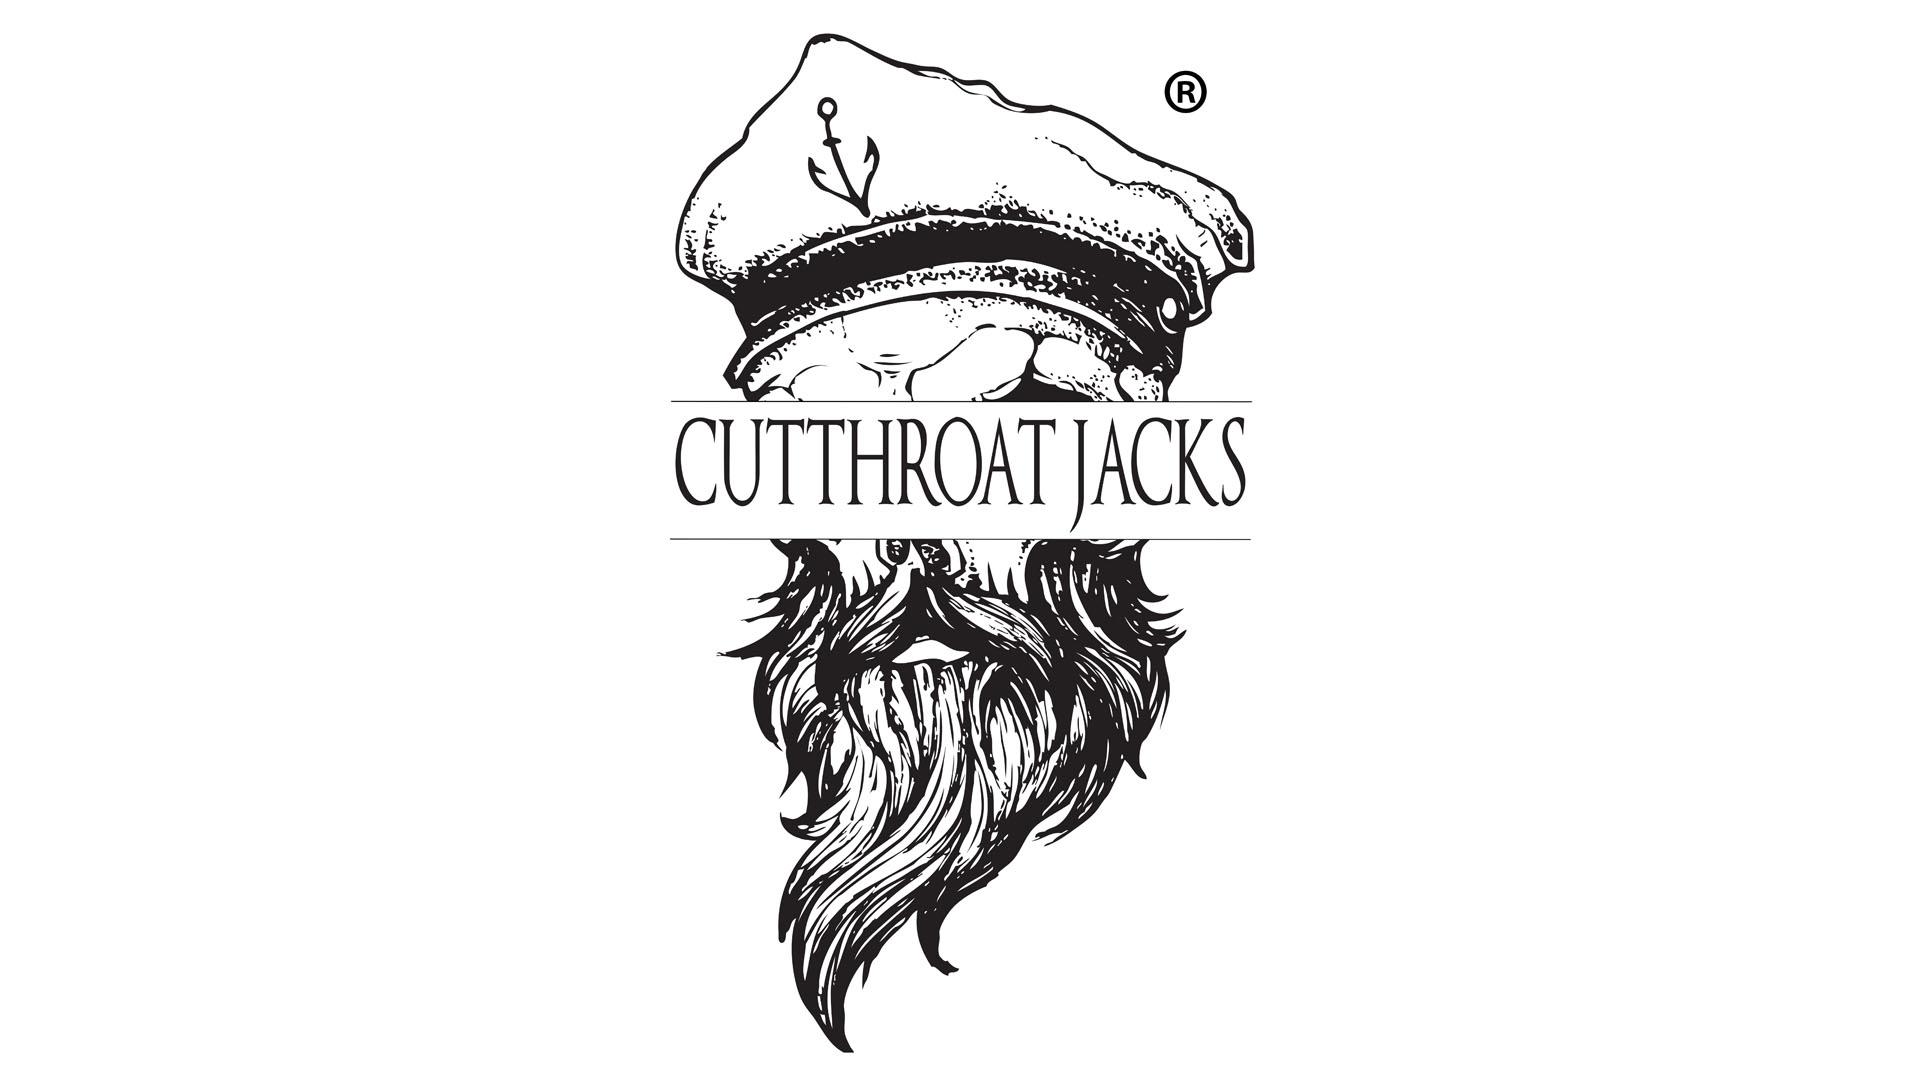 CutthroatJacks